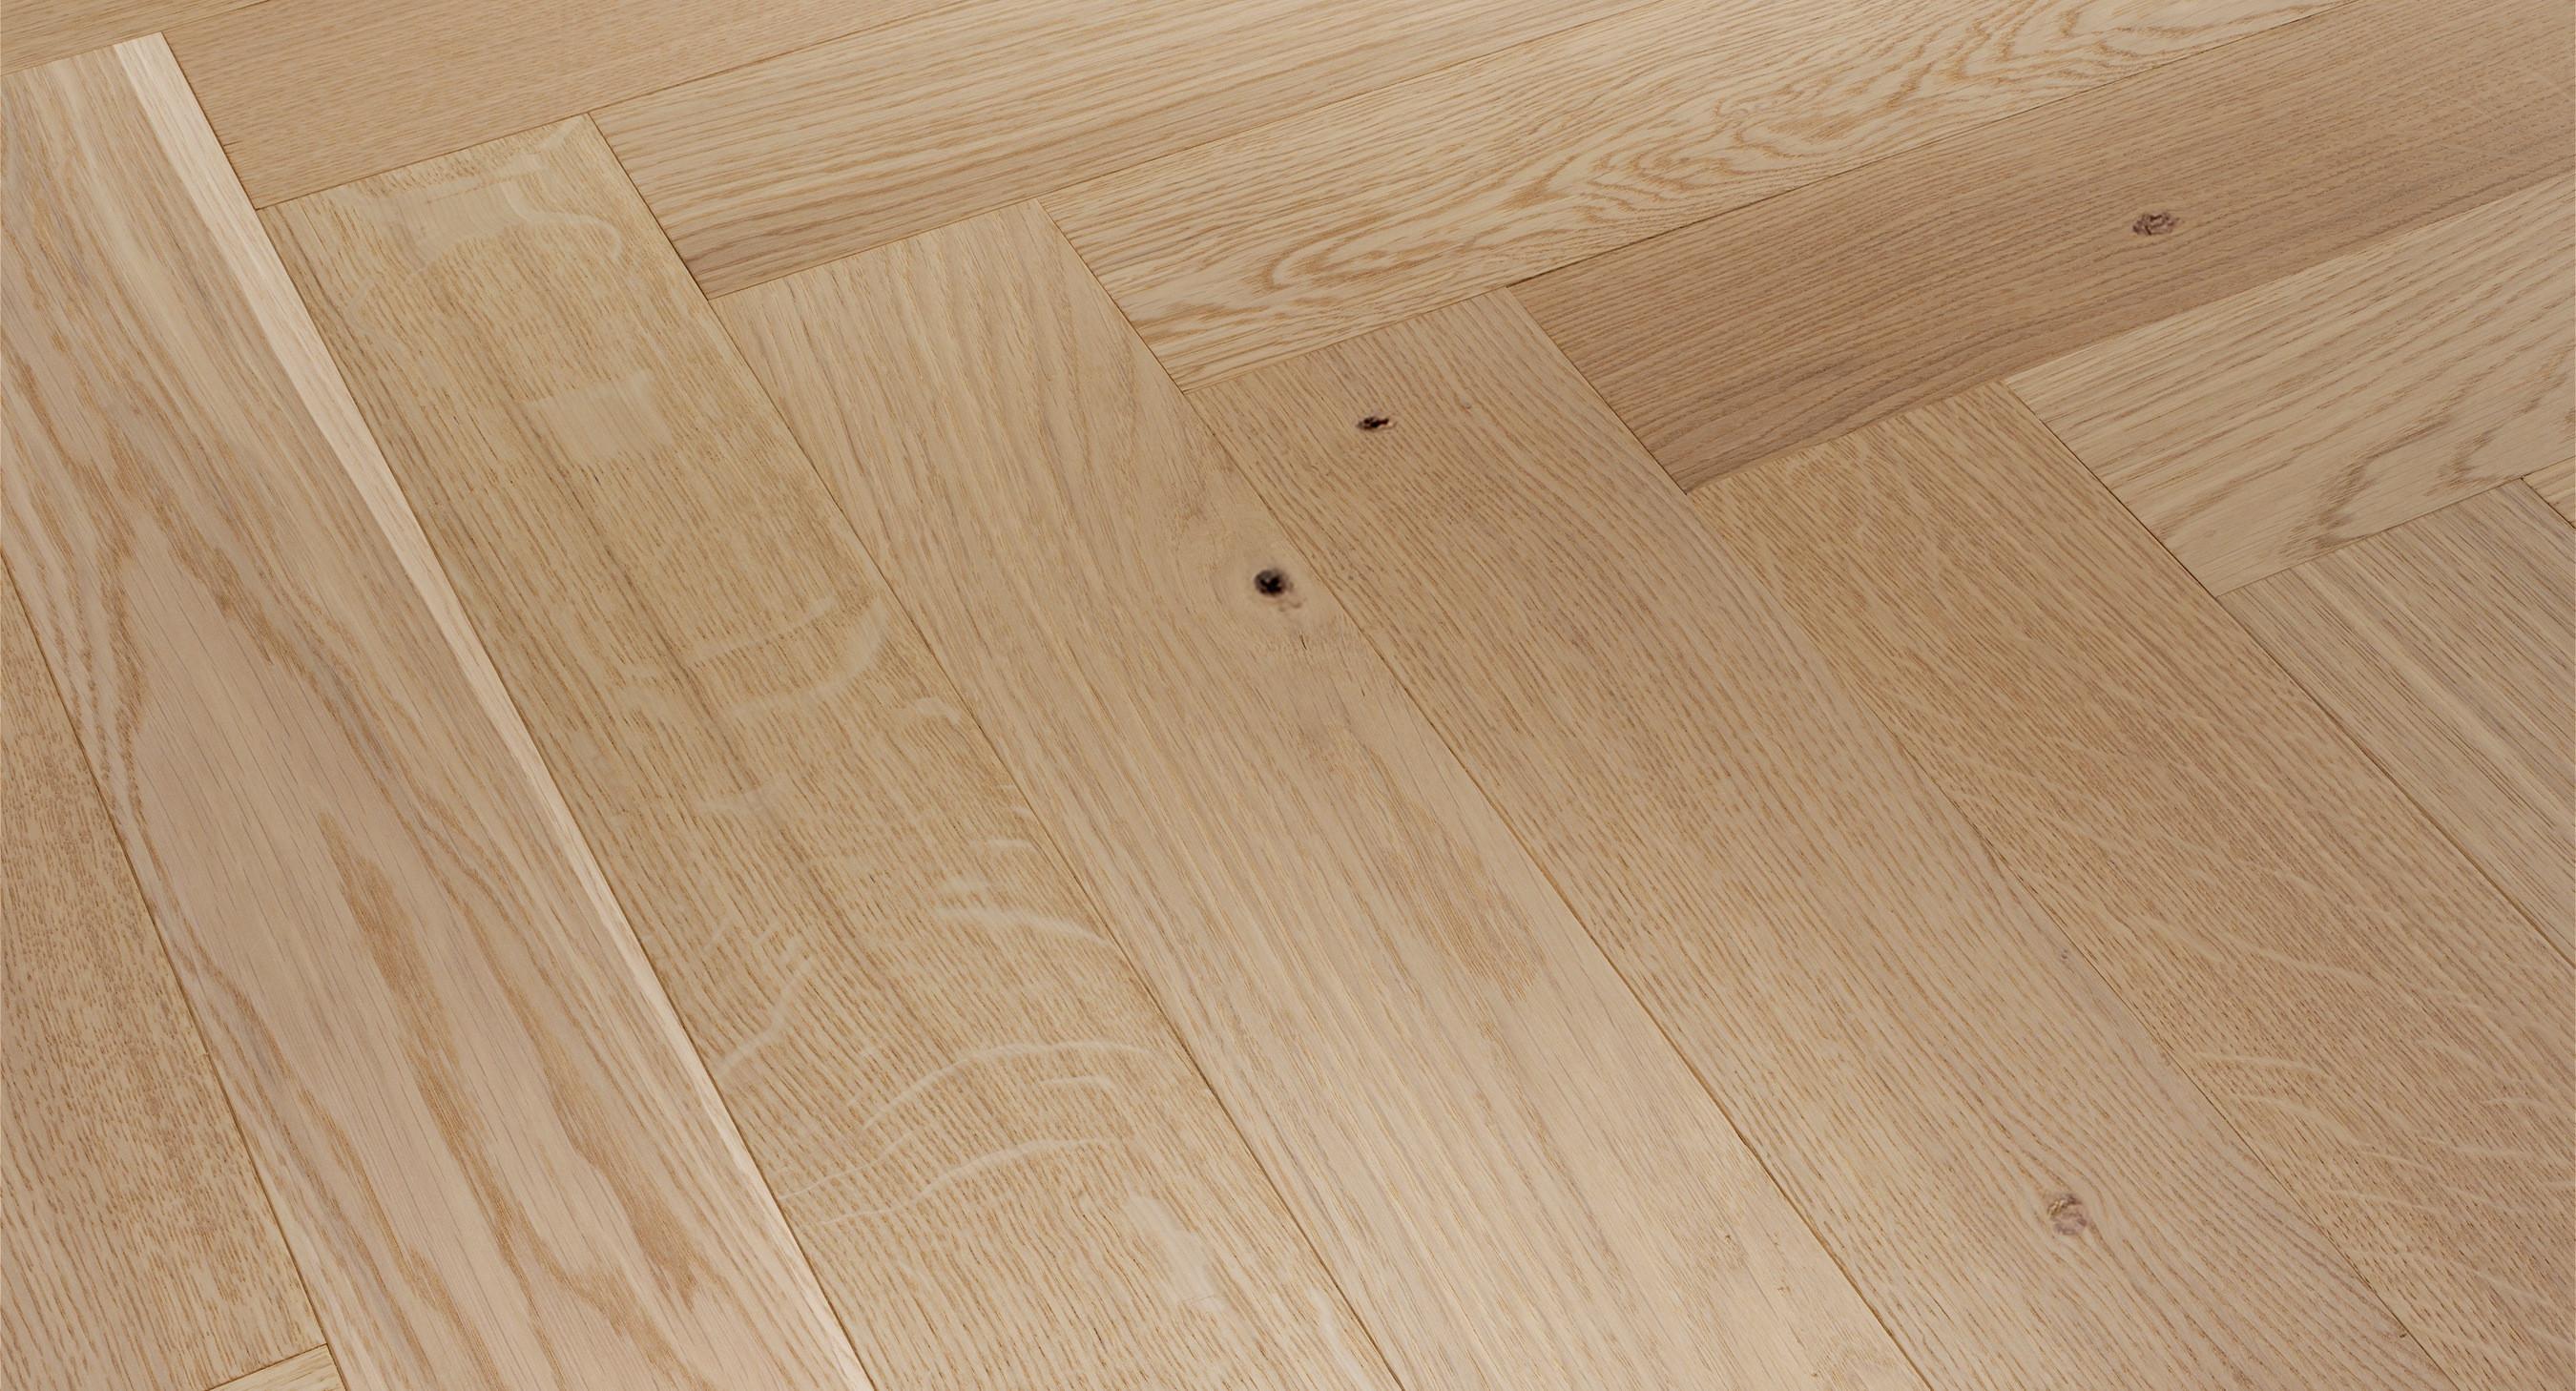 mohawk hardwood flooring golden oak of golden oak flooring lovely wood plank tile flooring new decorating inside golden oak flooring awesome trendtime engineered wood flooring products image of golden oak flooring lovely wood